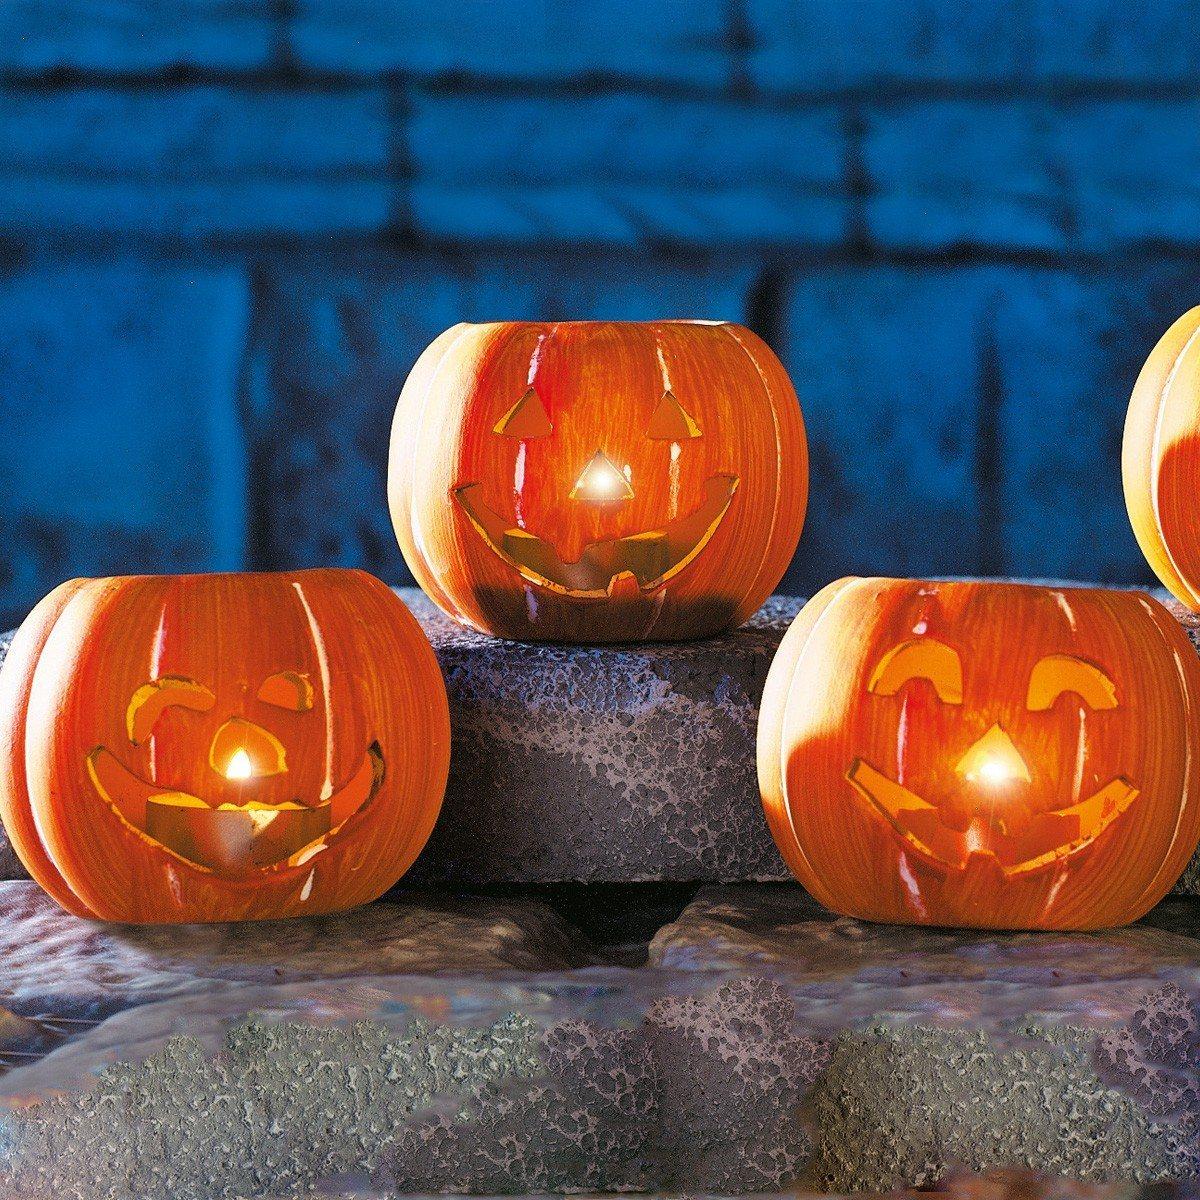 3 Halloween Pumpkin Candle Holders with Tea Lights 7cm